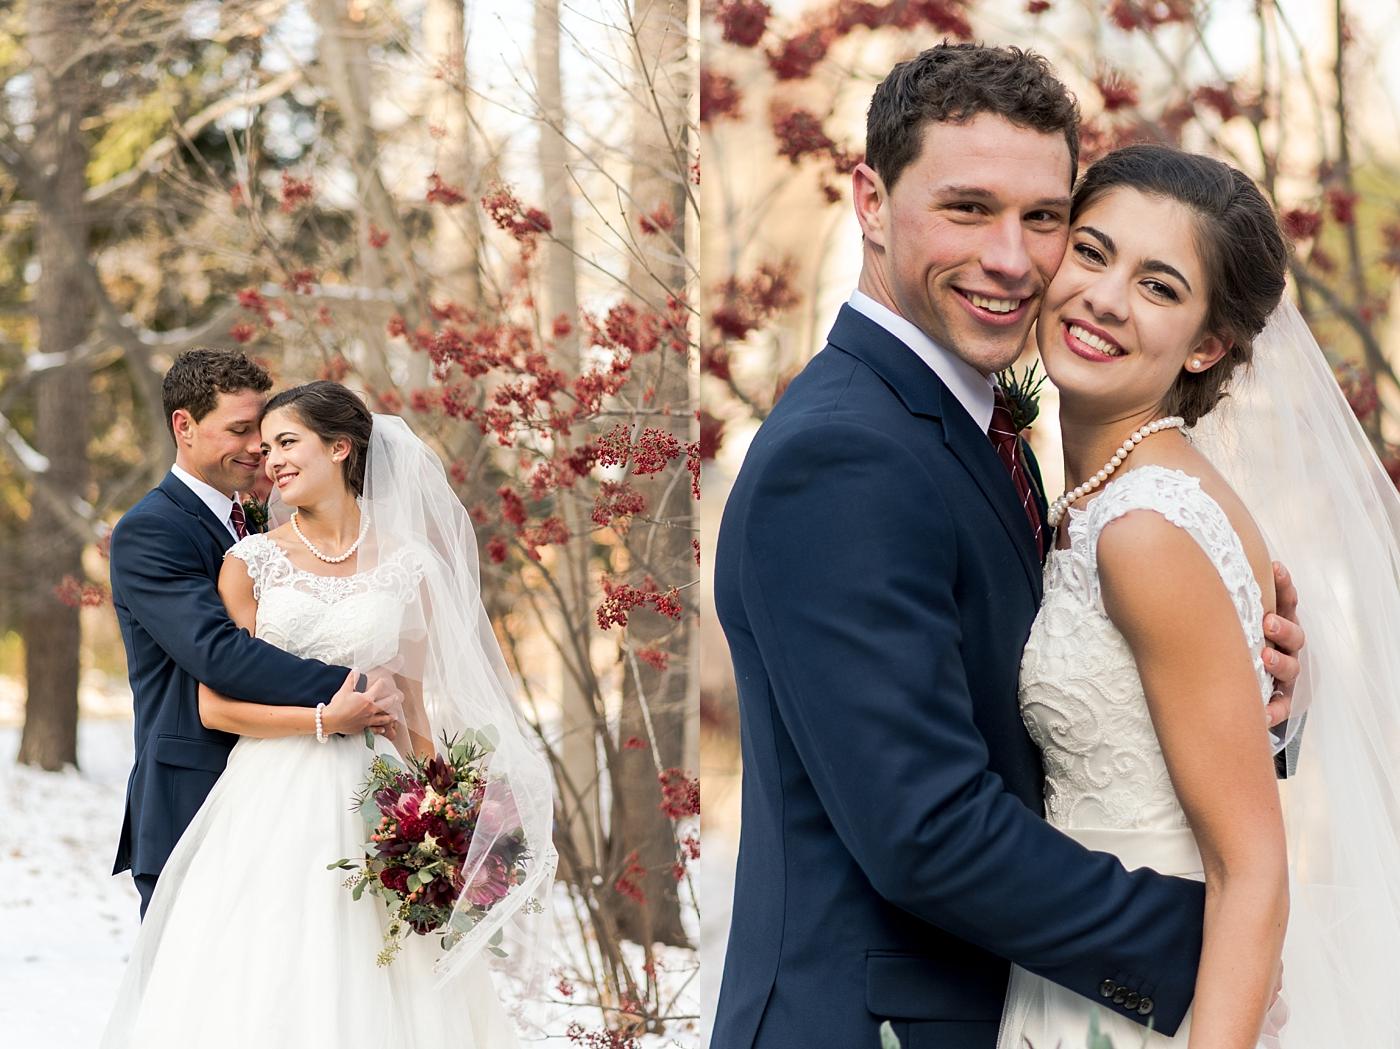 indianapolis-top-rated-wedding-photographers_0446.jpg